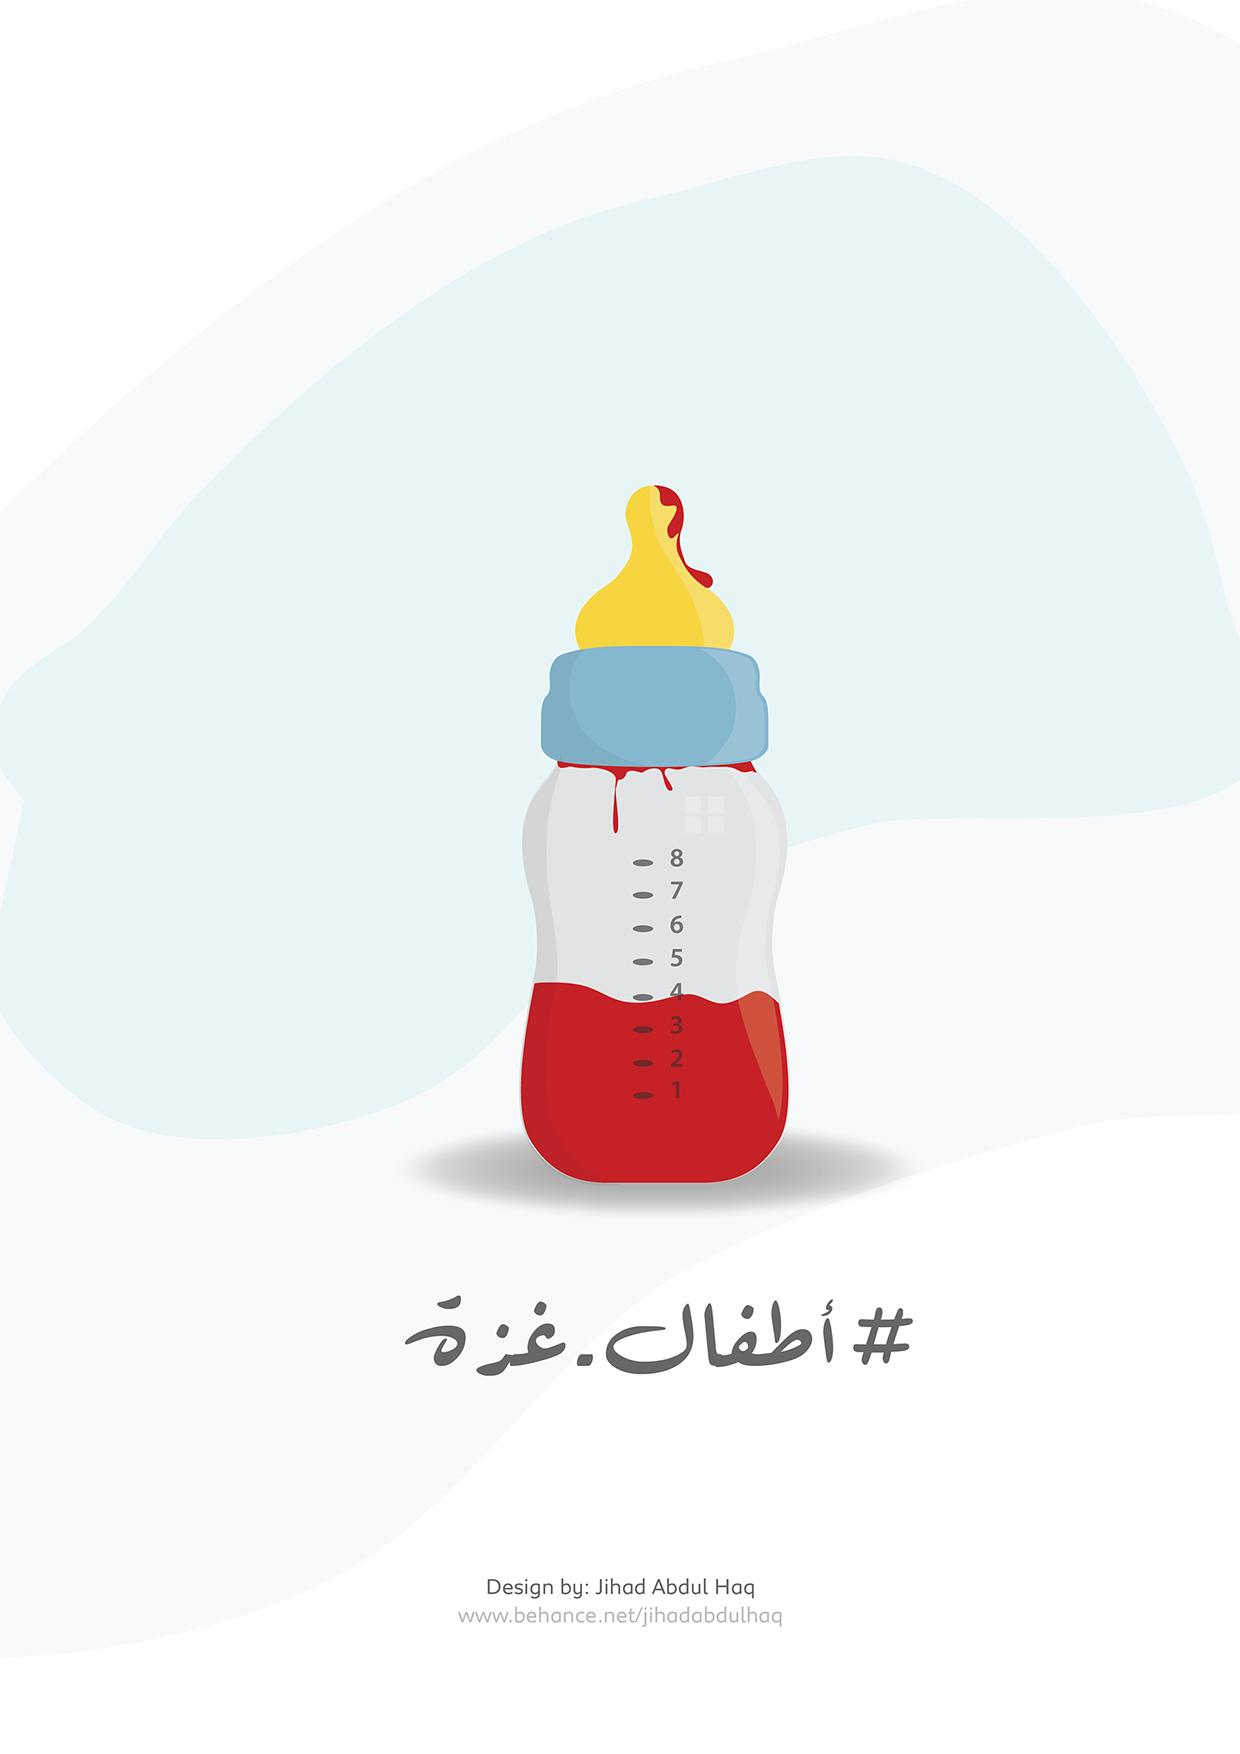 #ChildrenOfGaza. By Jihad Abdul Haq, on Behance.